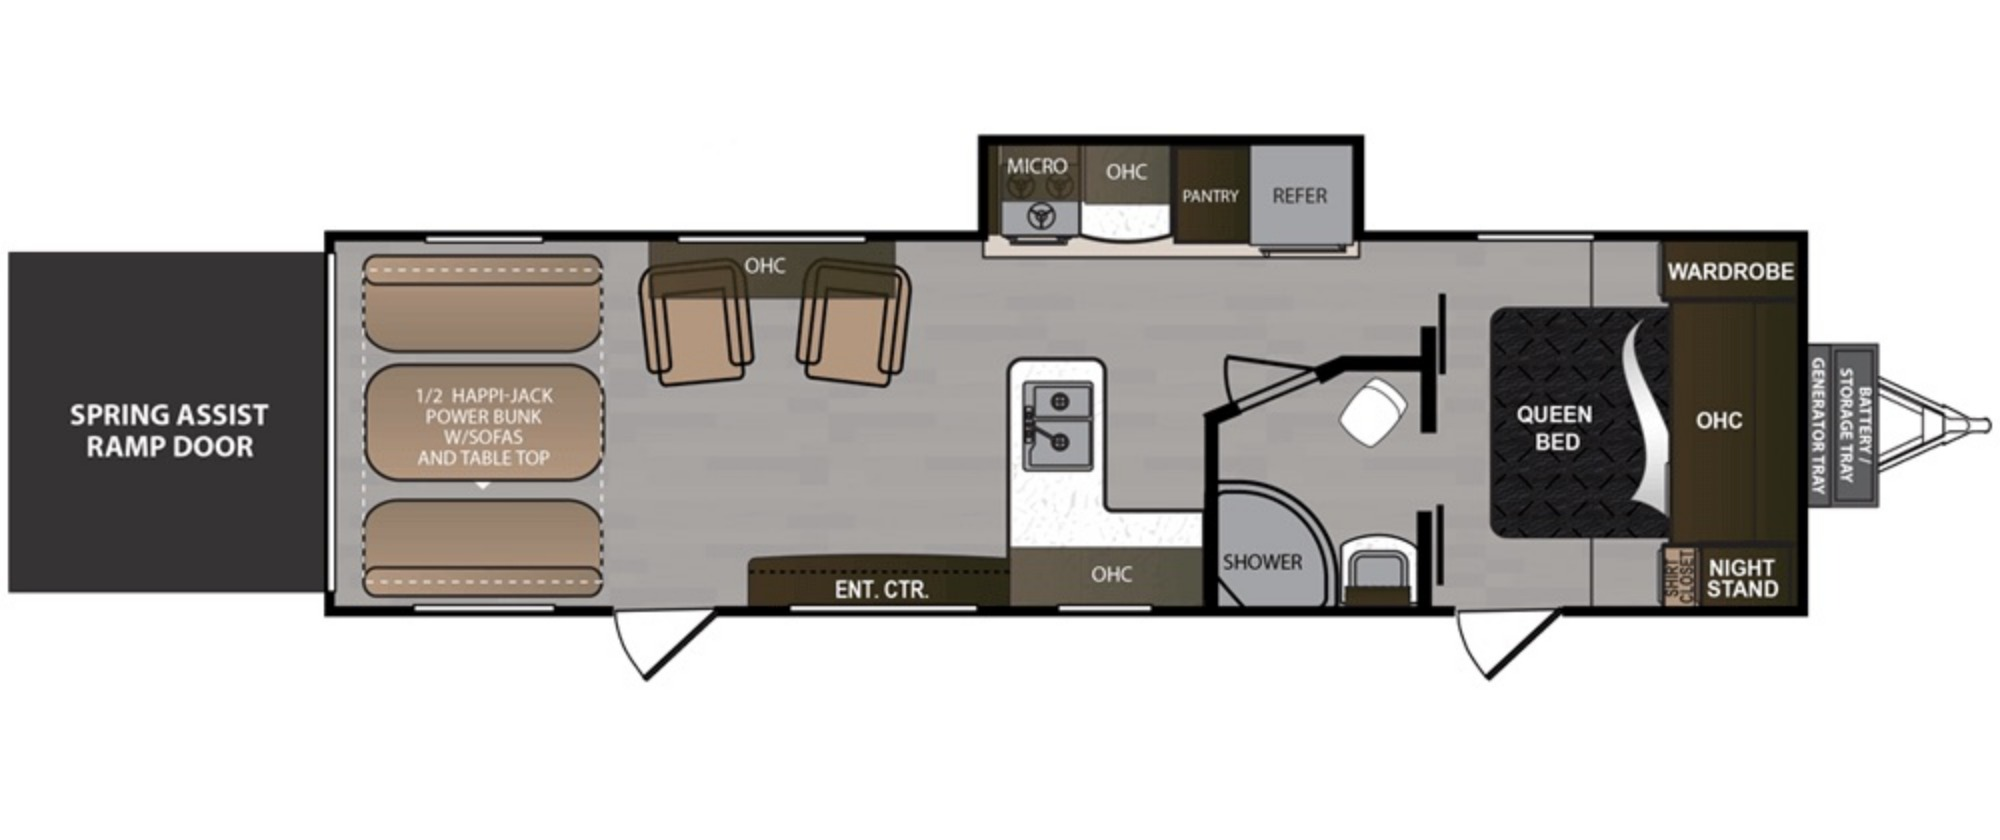 View Floor Plan for 2019 DUTCHMEN RUBICON 301XLT